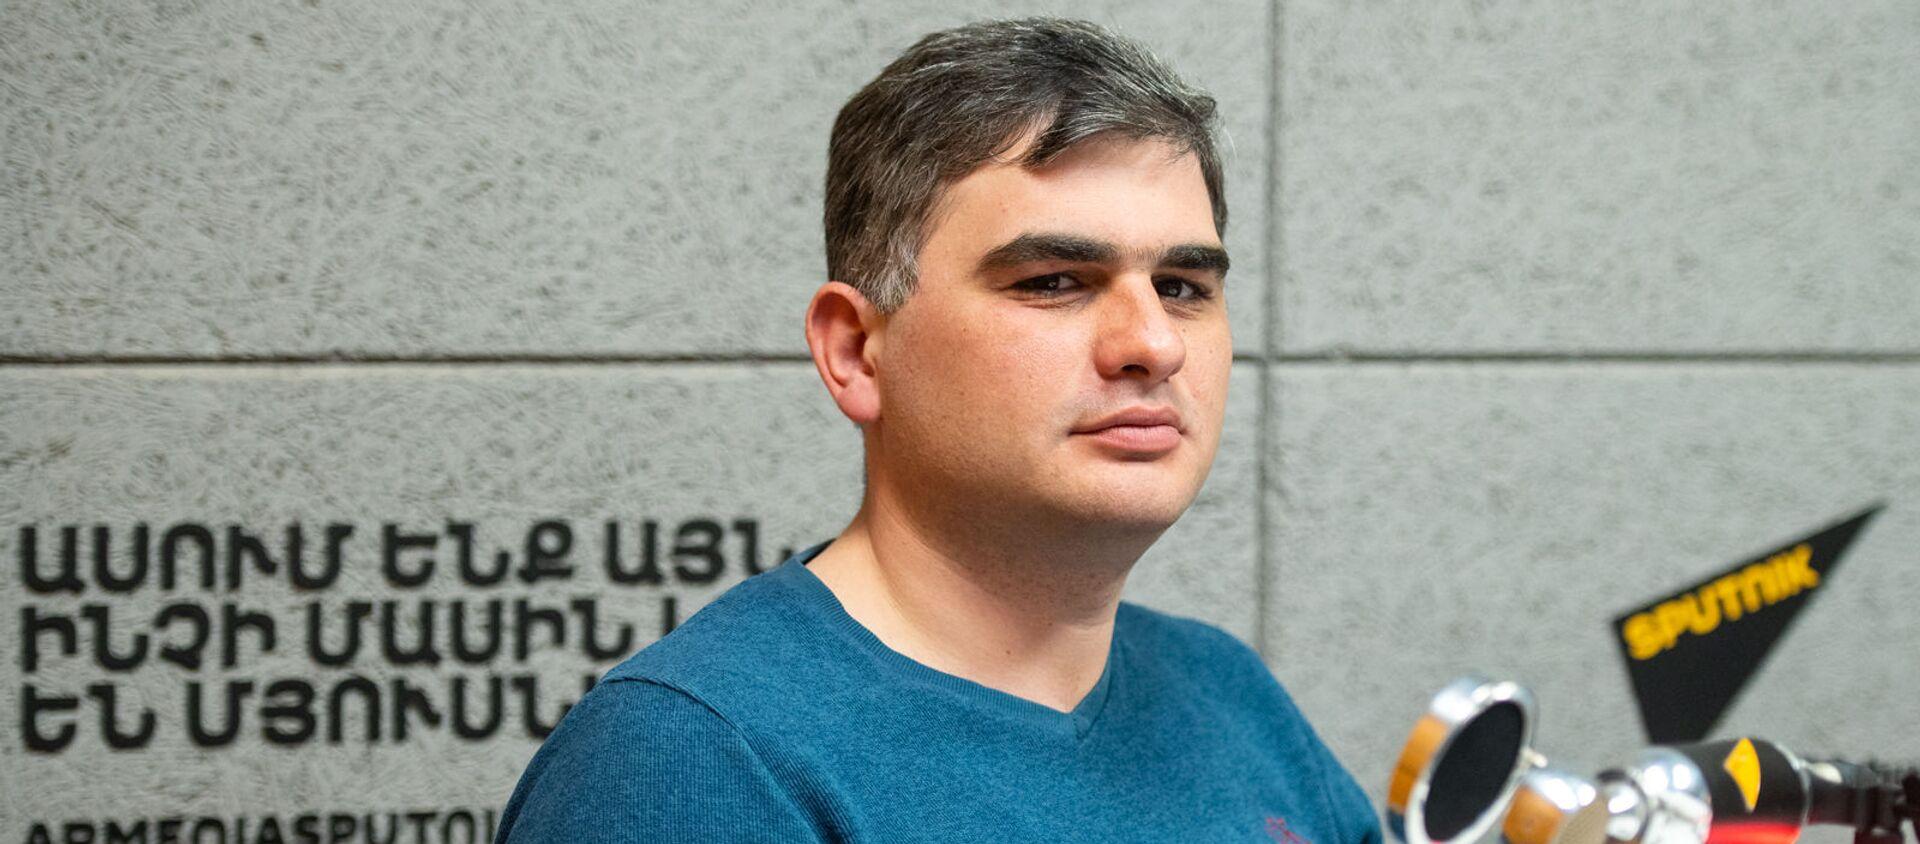 Сурен Парсян в гостях радио Sputnik Армения - Sputnik Արմենիա, 1920, 01.06.2021